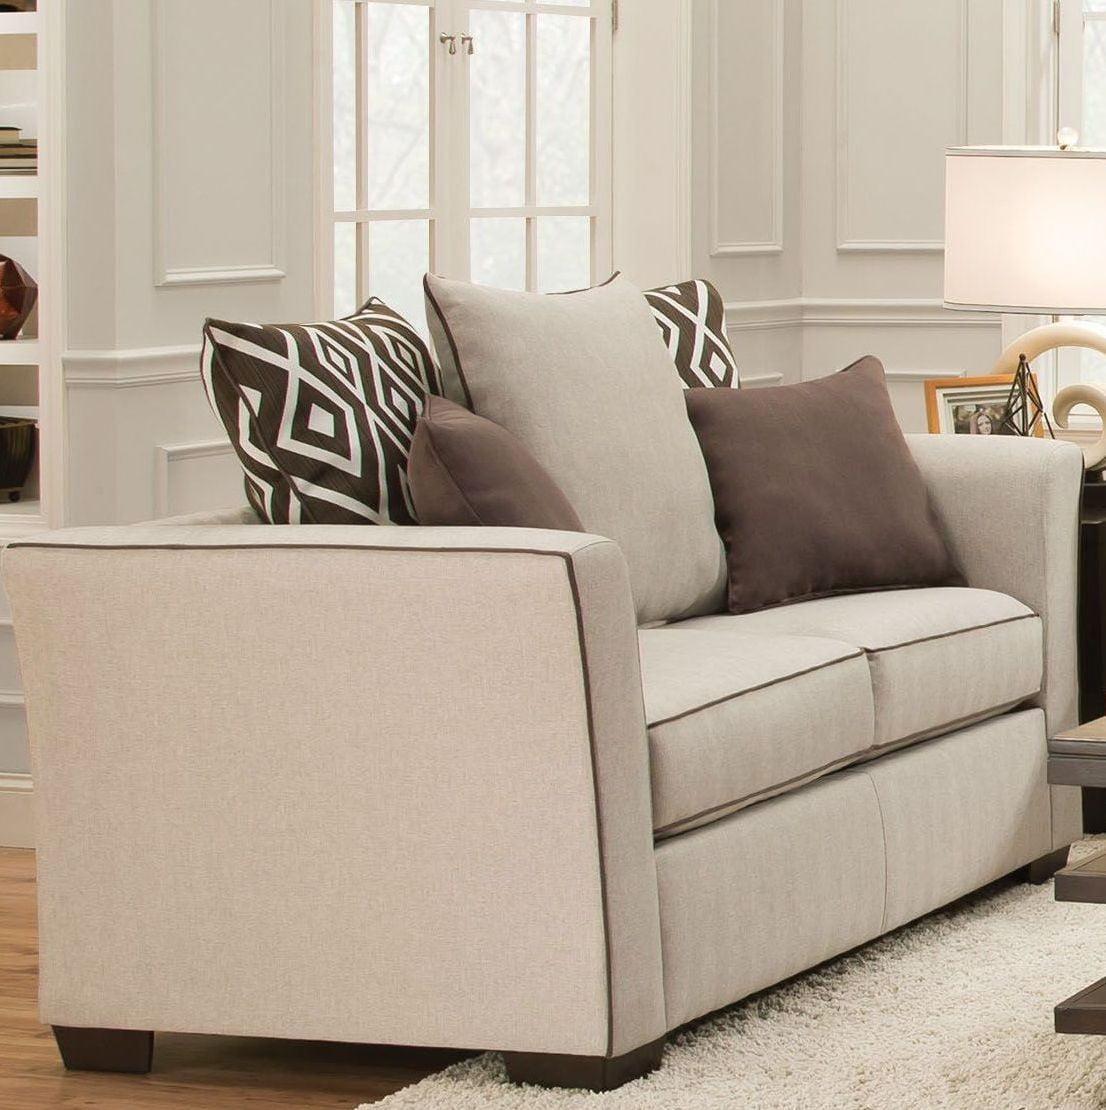 Stewart Oyster Linen Loveseat from Acme | Coleman Furniture